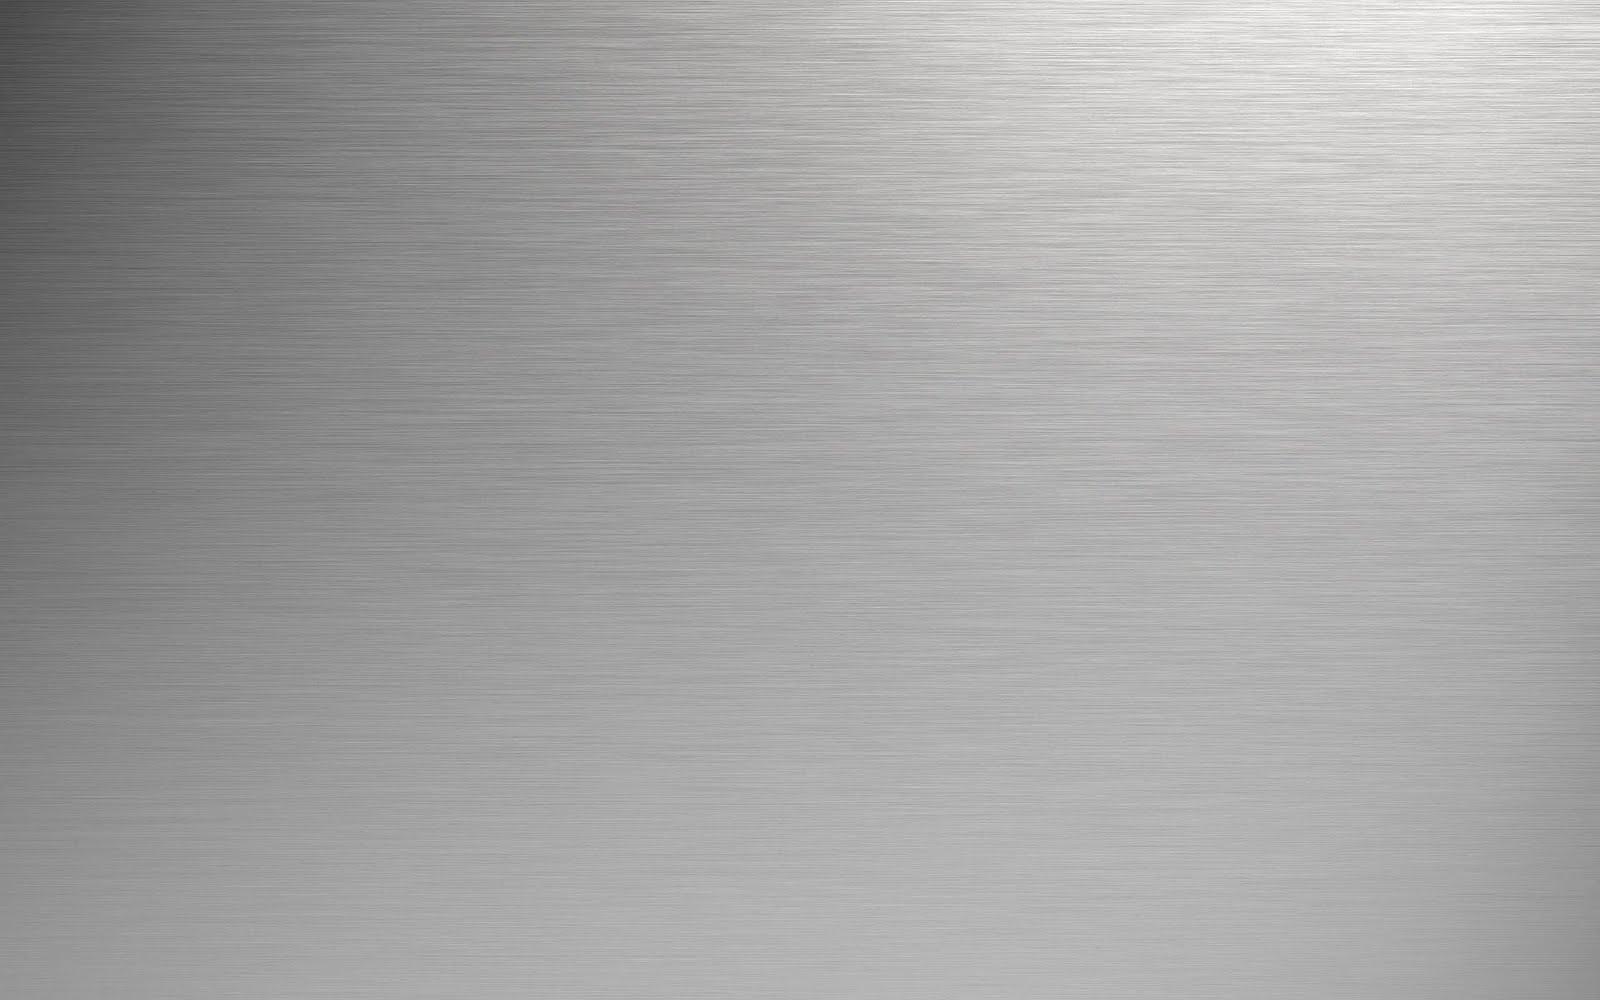 Grey background wallpaper wallpapersafari - Light and dark grey wallpaper ...